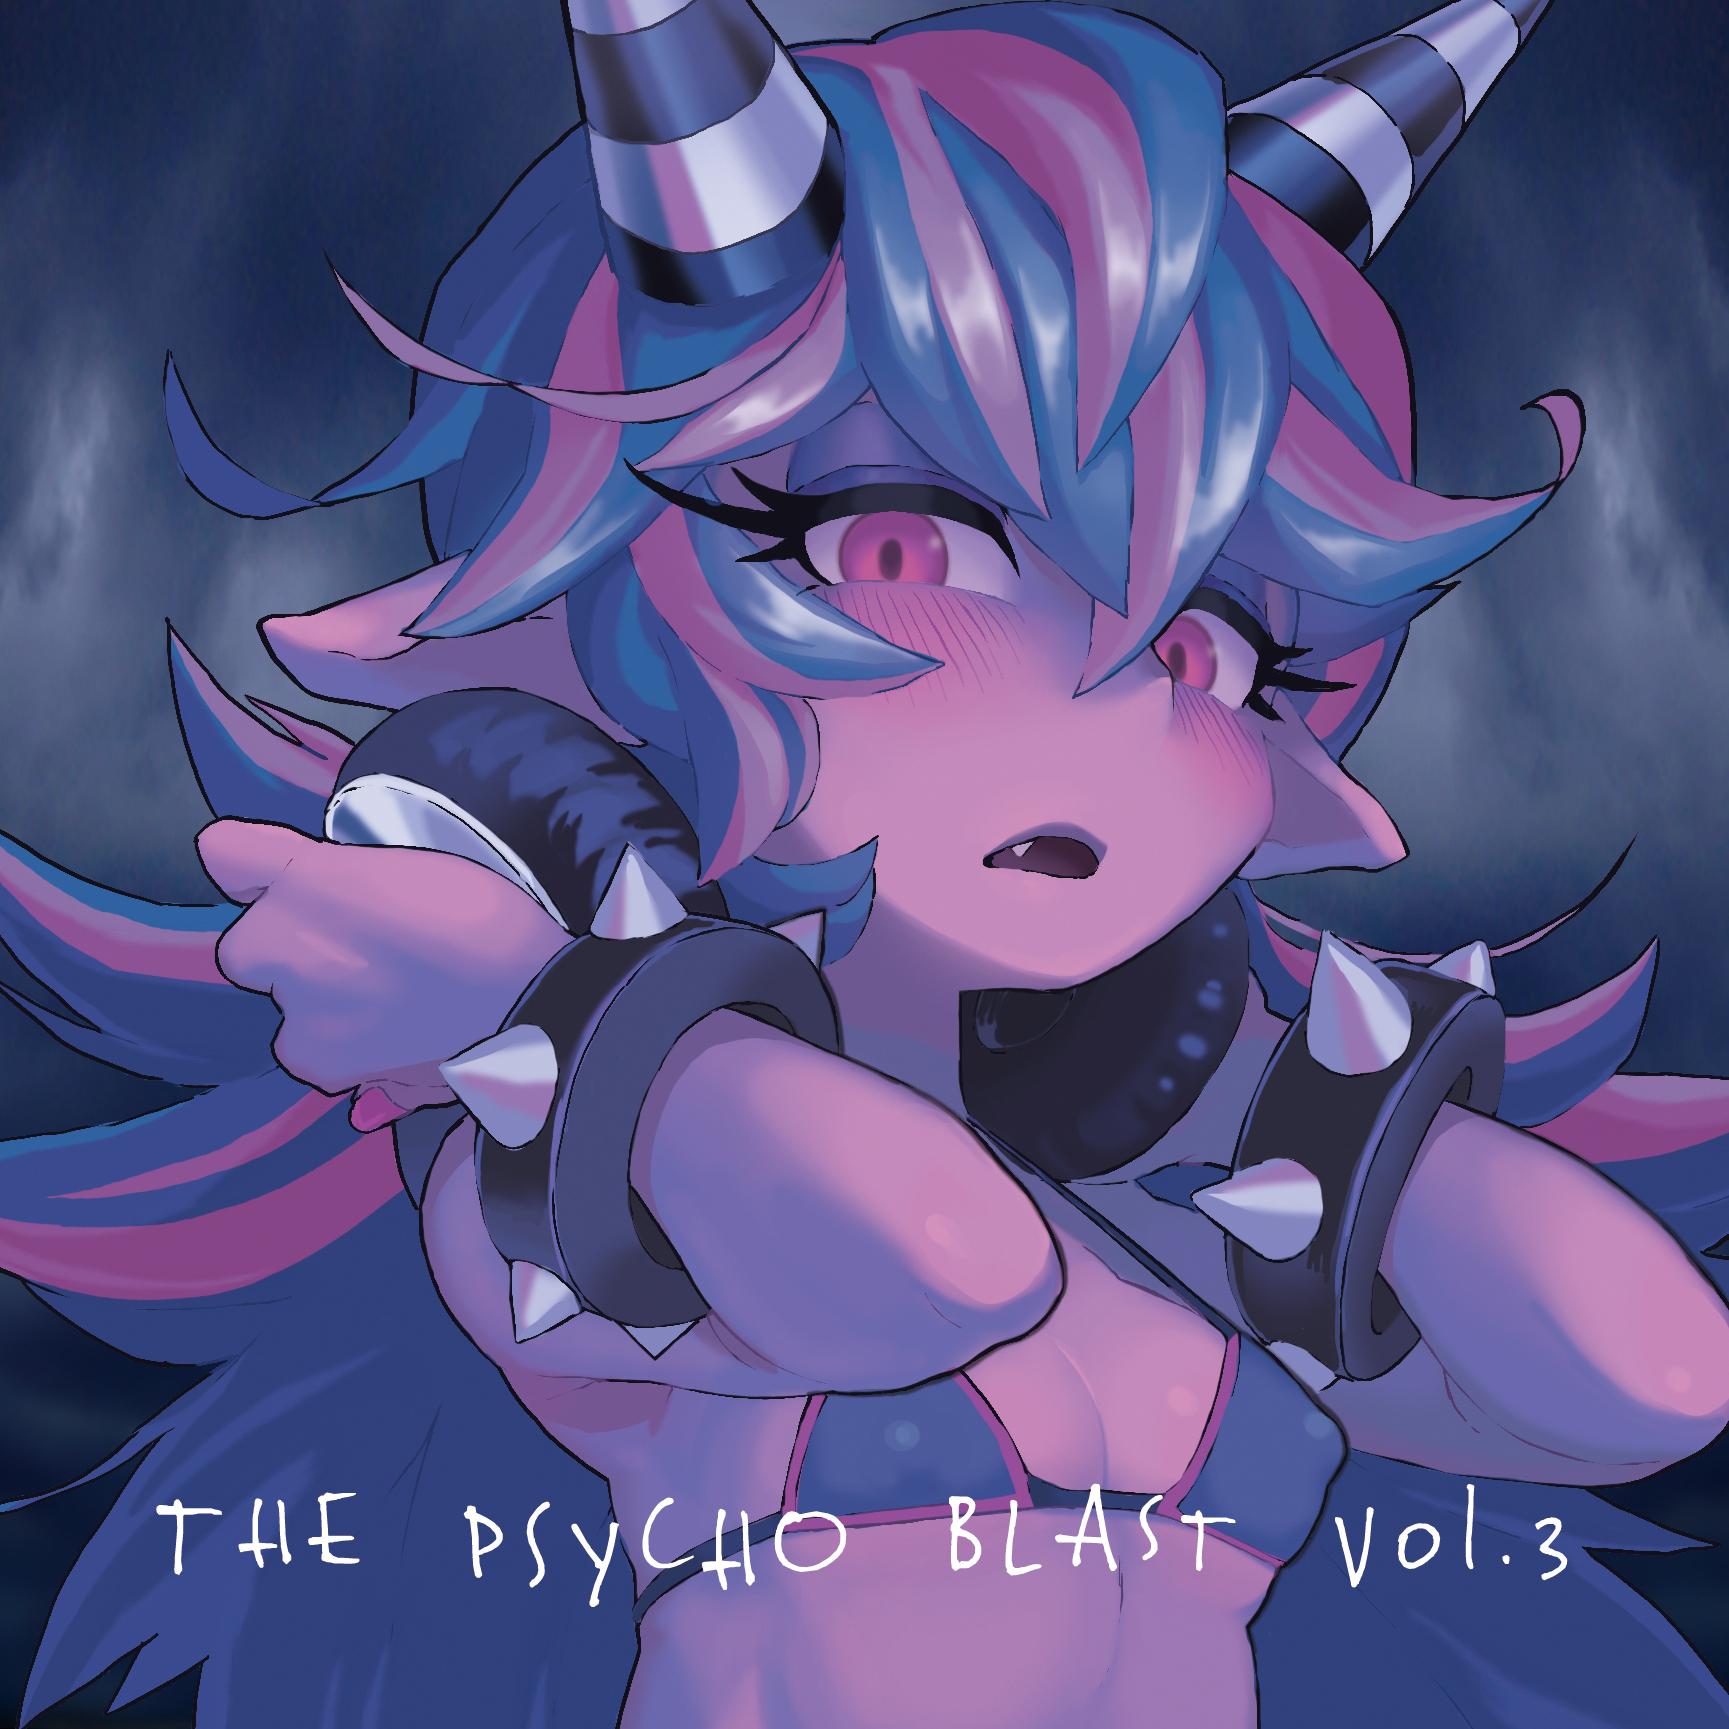 THE PSYCHO BLAST Vol.3